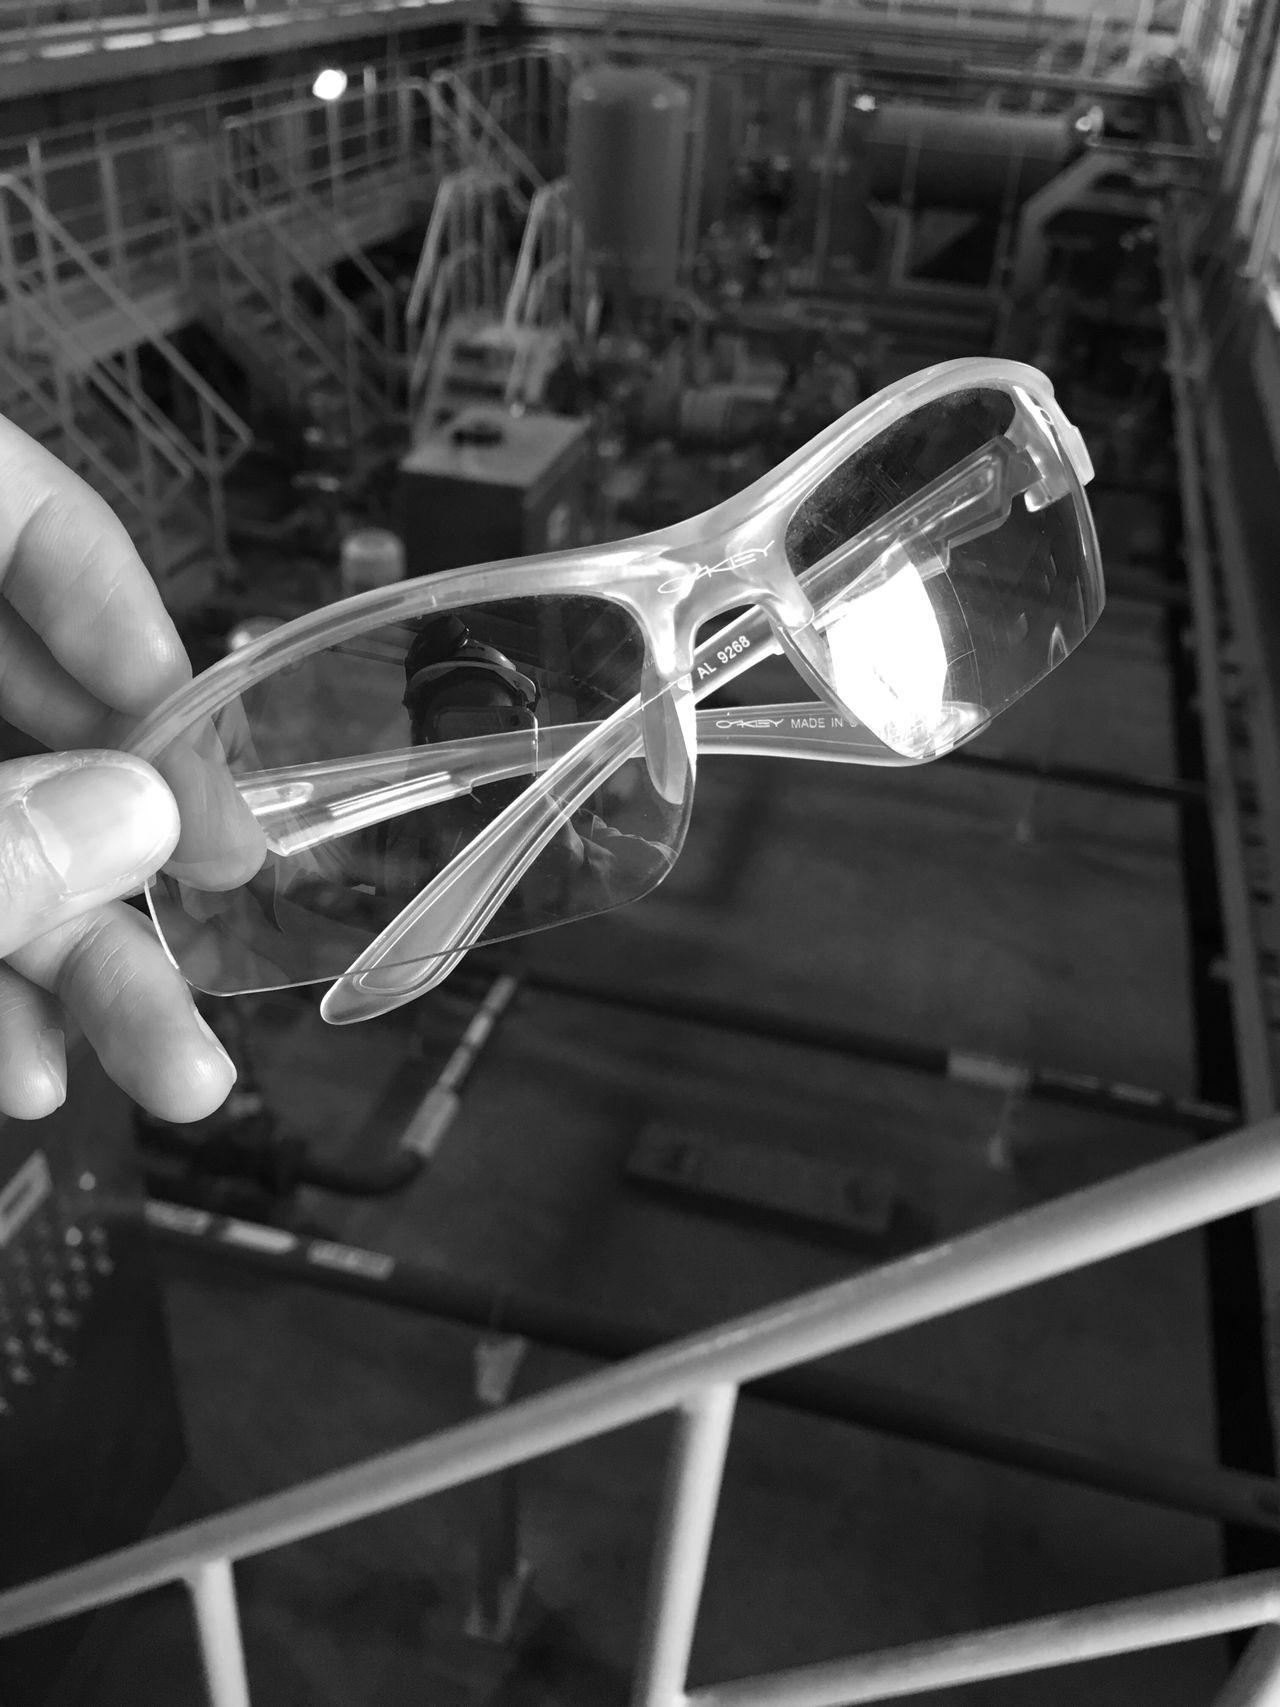 Powerplant Construction Safetyglass Iphonephotography EyeEmGalley